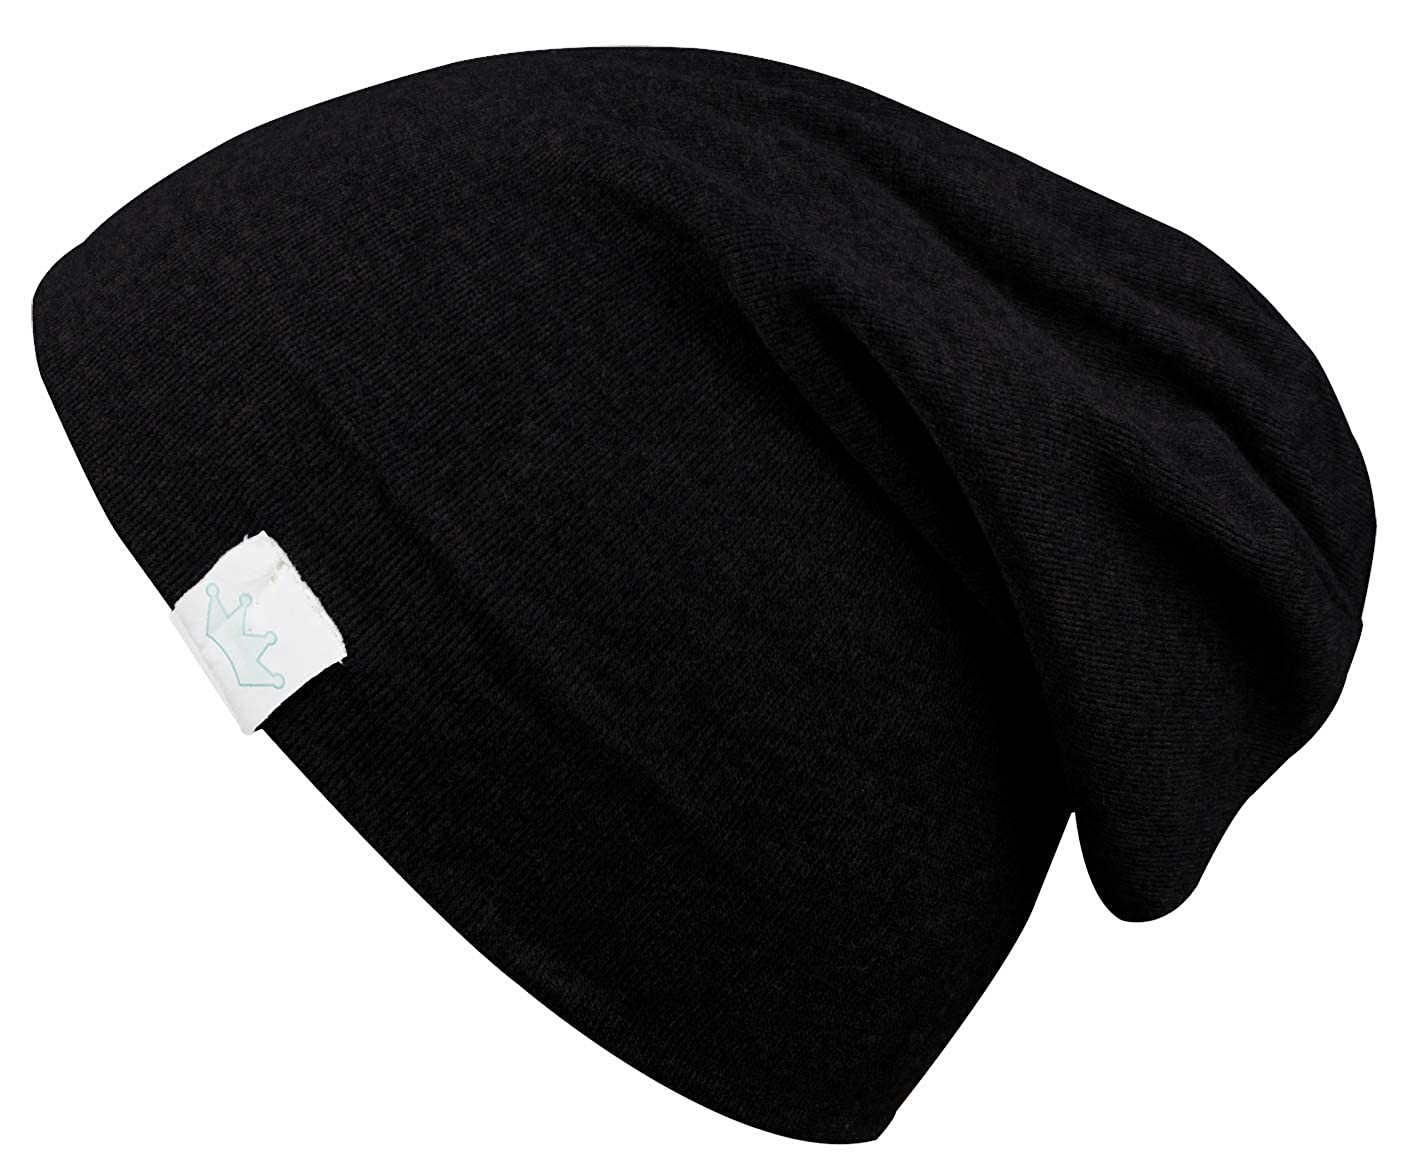 Cute Boy Girl Trendy Baby Toddler Hat Knit Beanie Warm Winter Cap